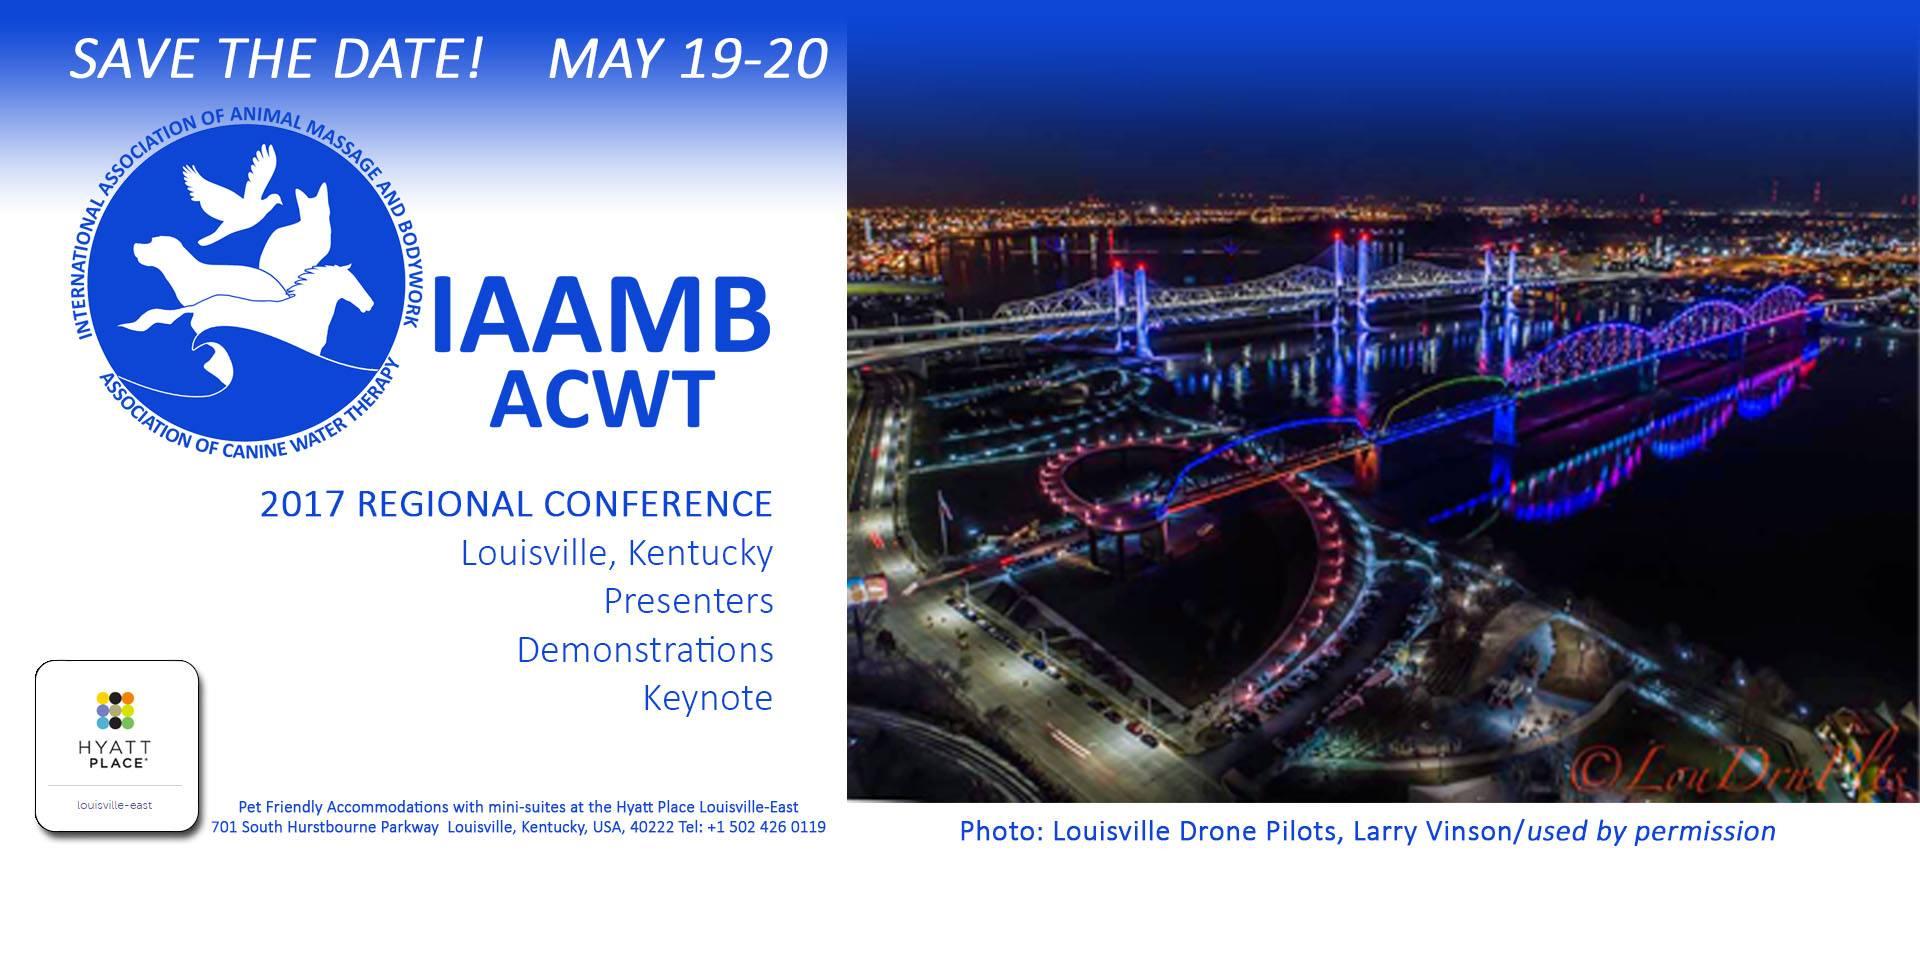 2017 IAAMB/ACWT Regional Conference Banner